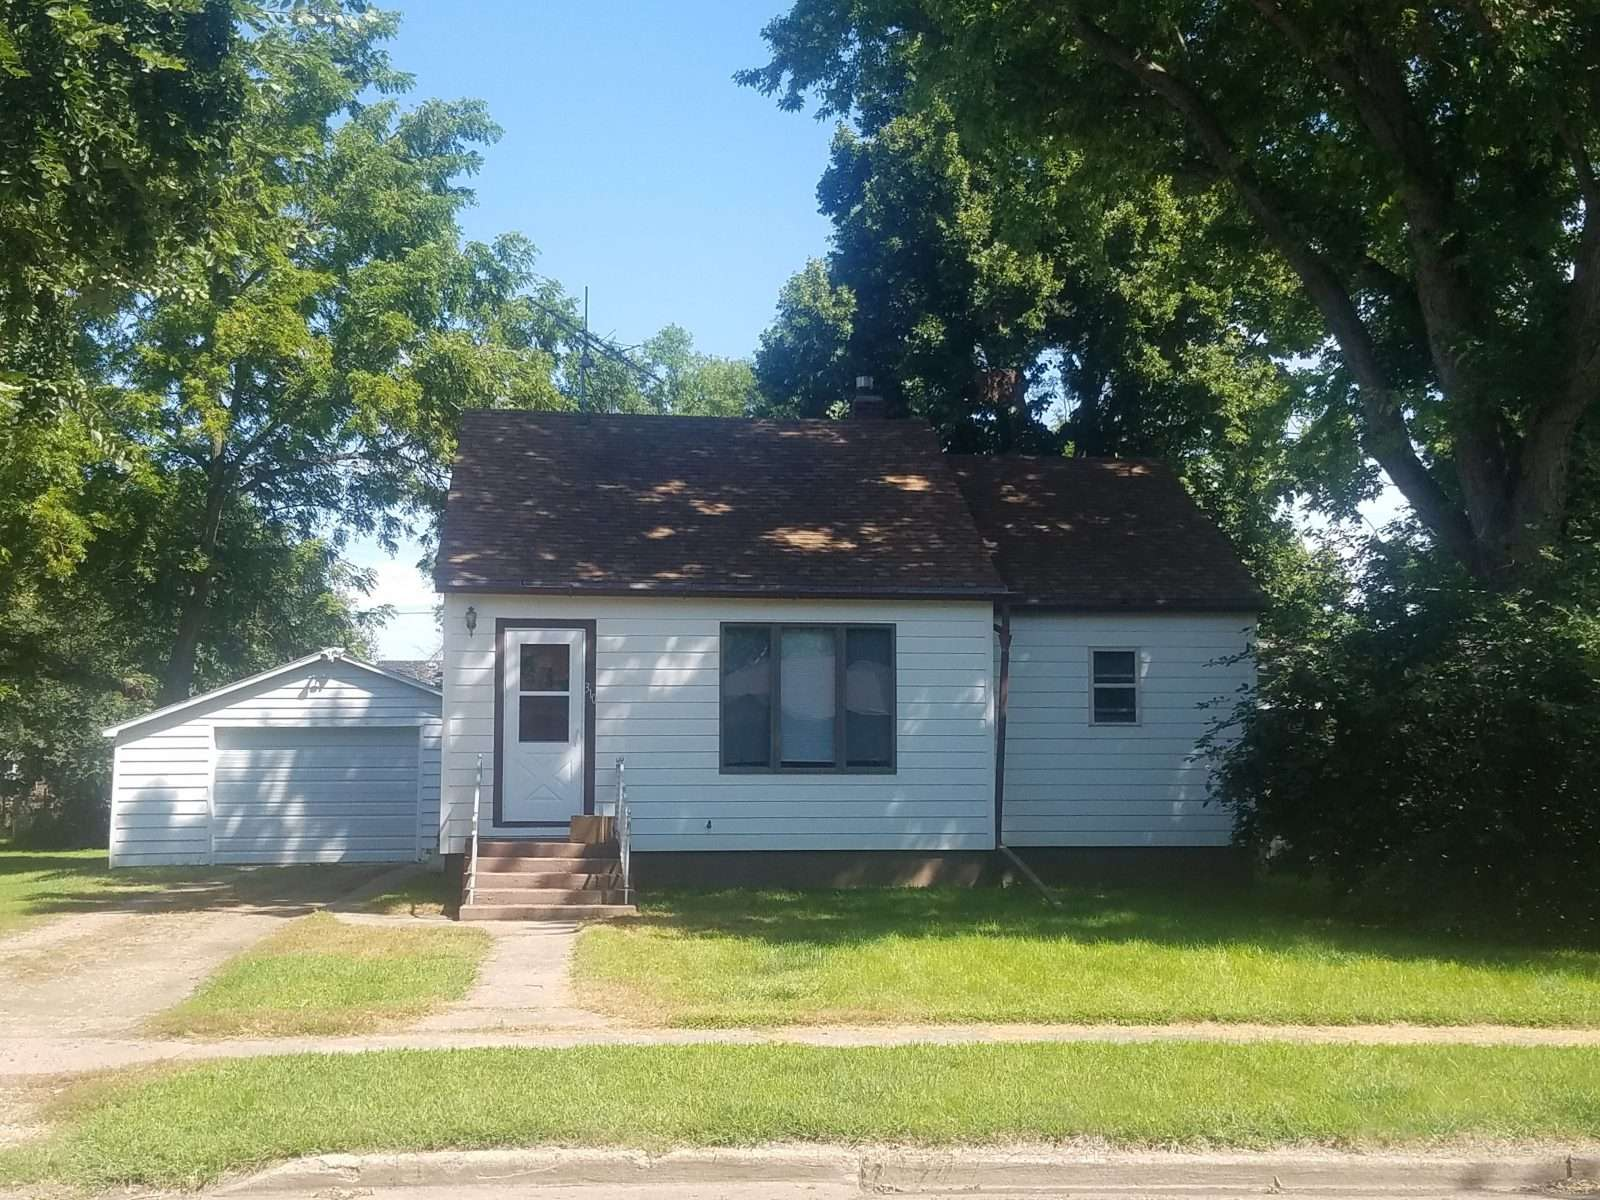 310 N. Peck St.